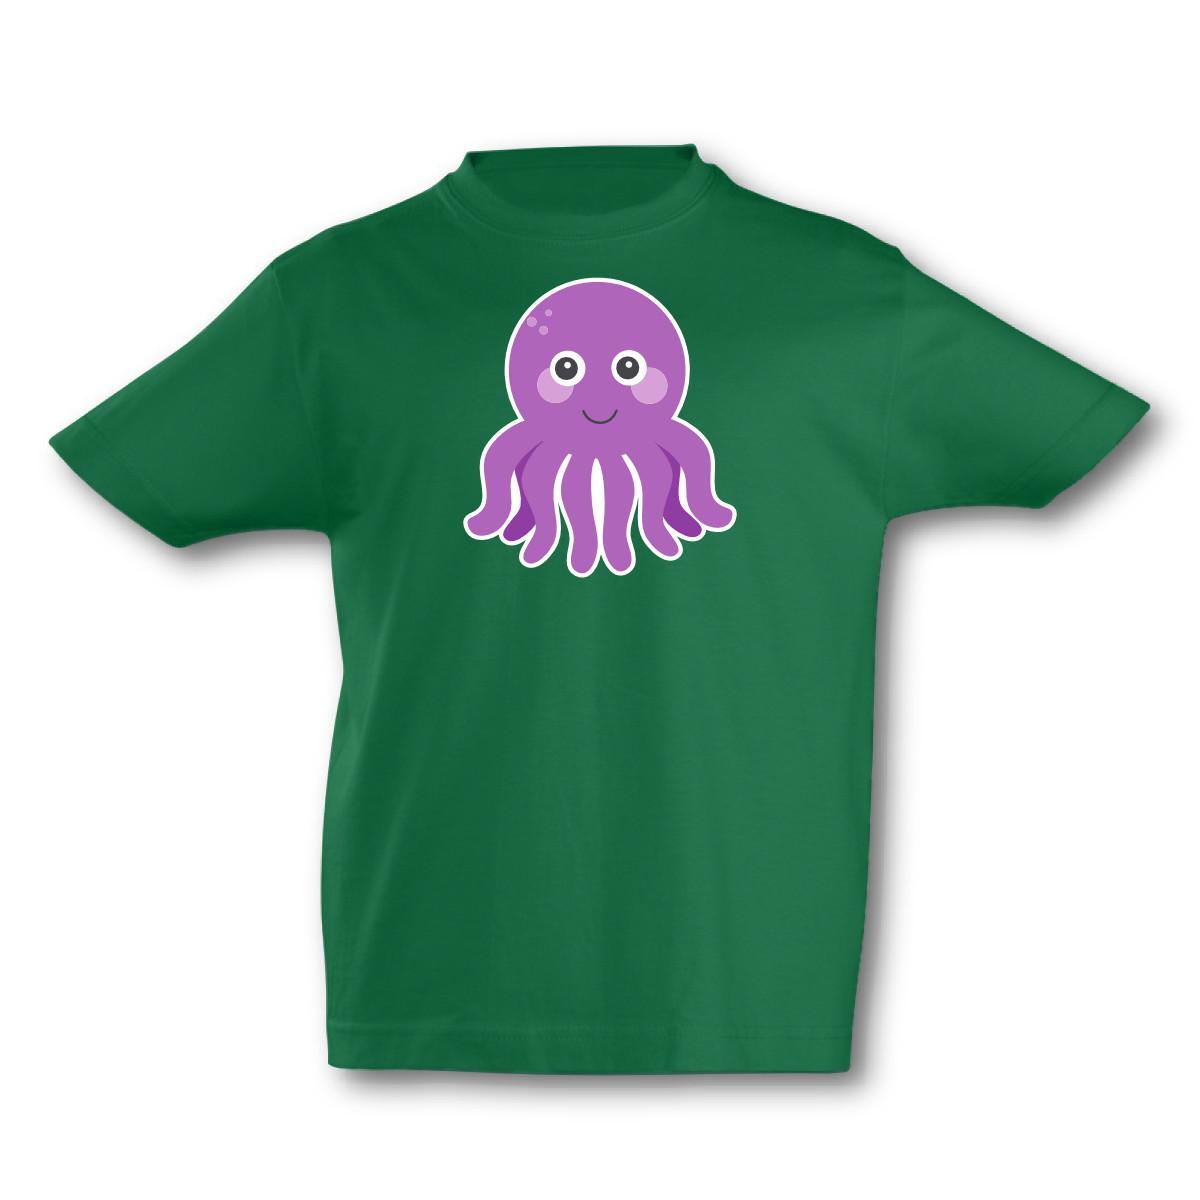 Kinder T-Shirt Süße Krake Tintenfisch Meer Tiere 7 Farben 94 - 128 ...